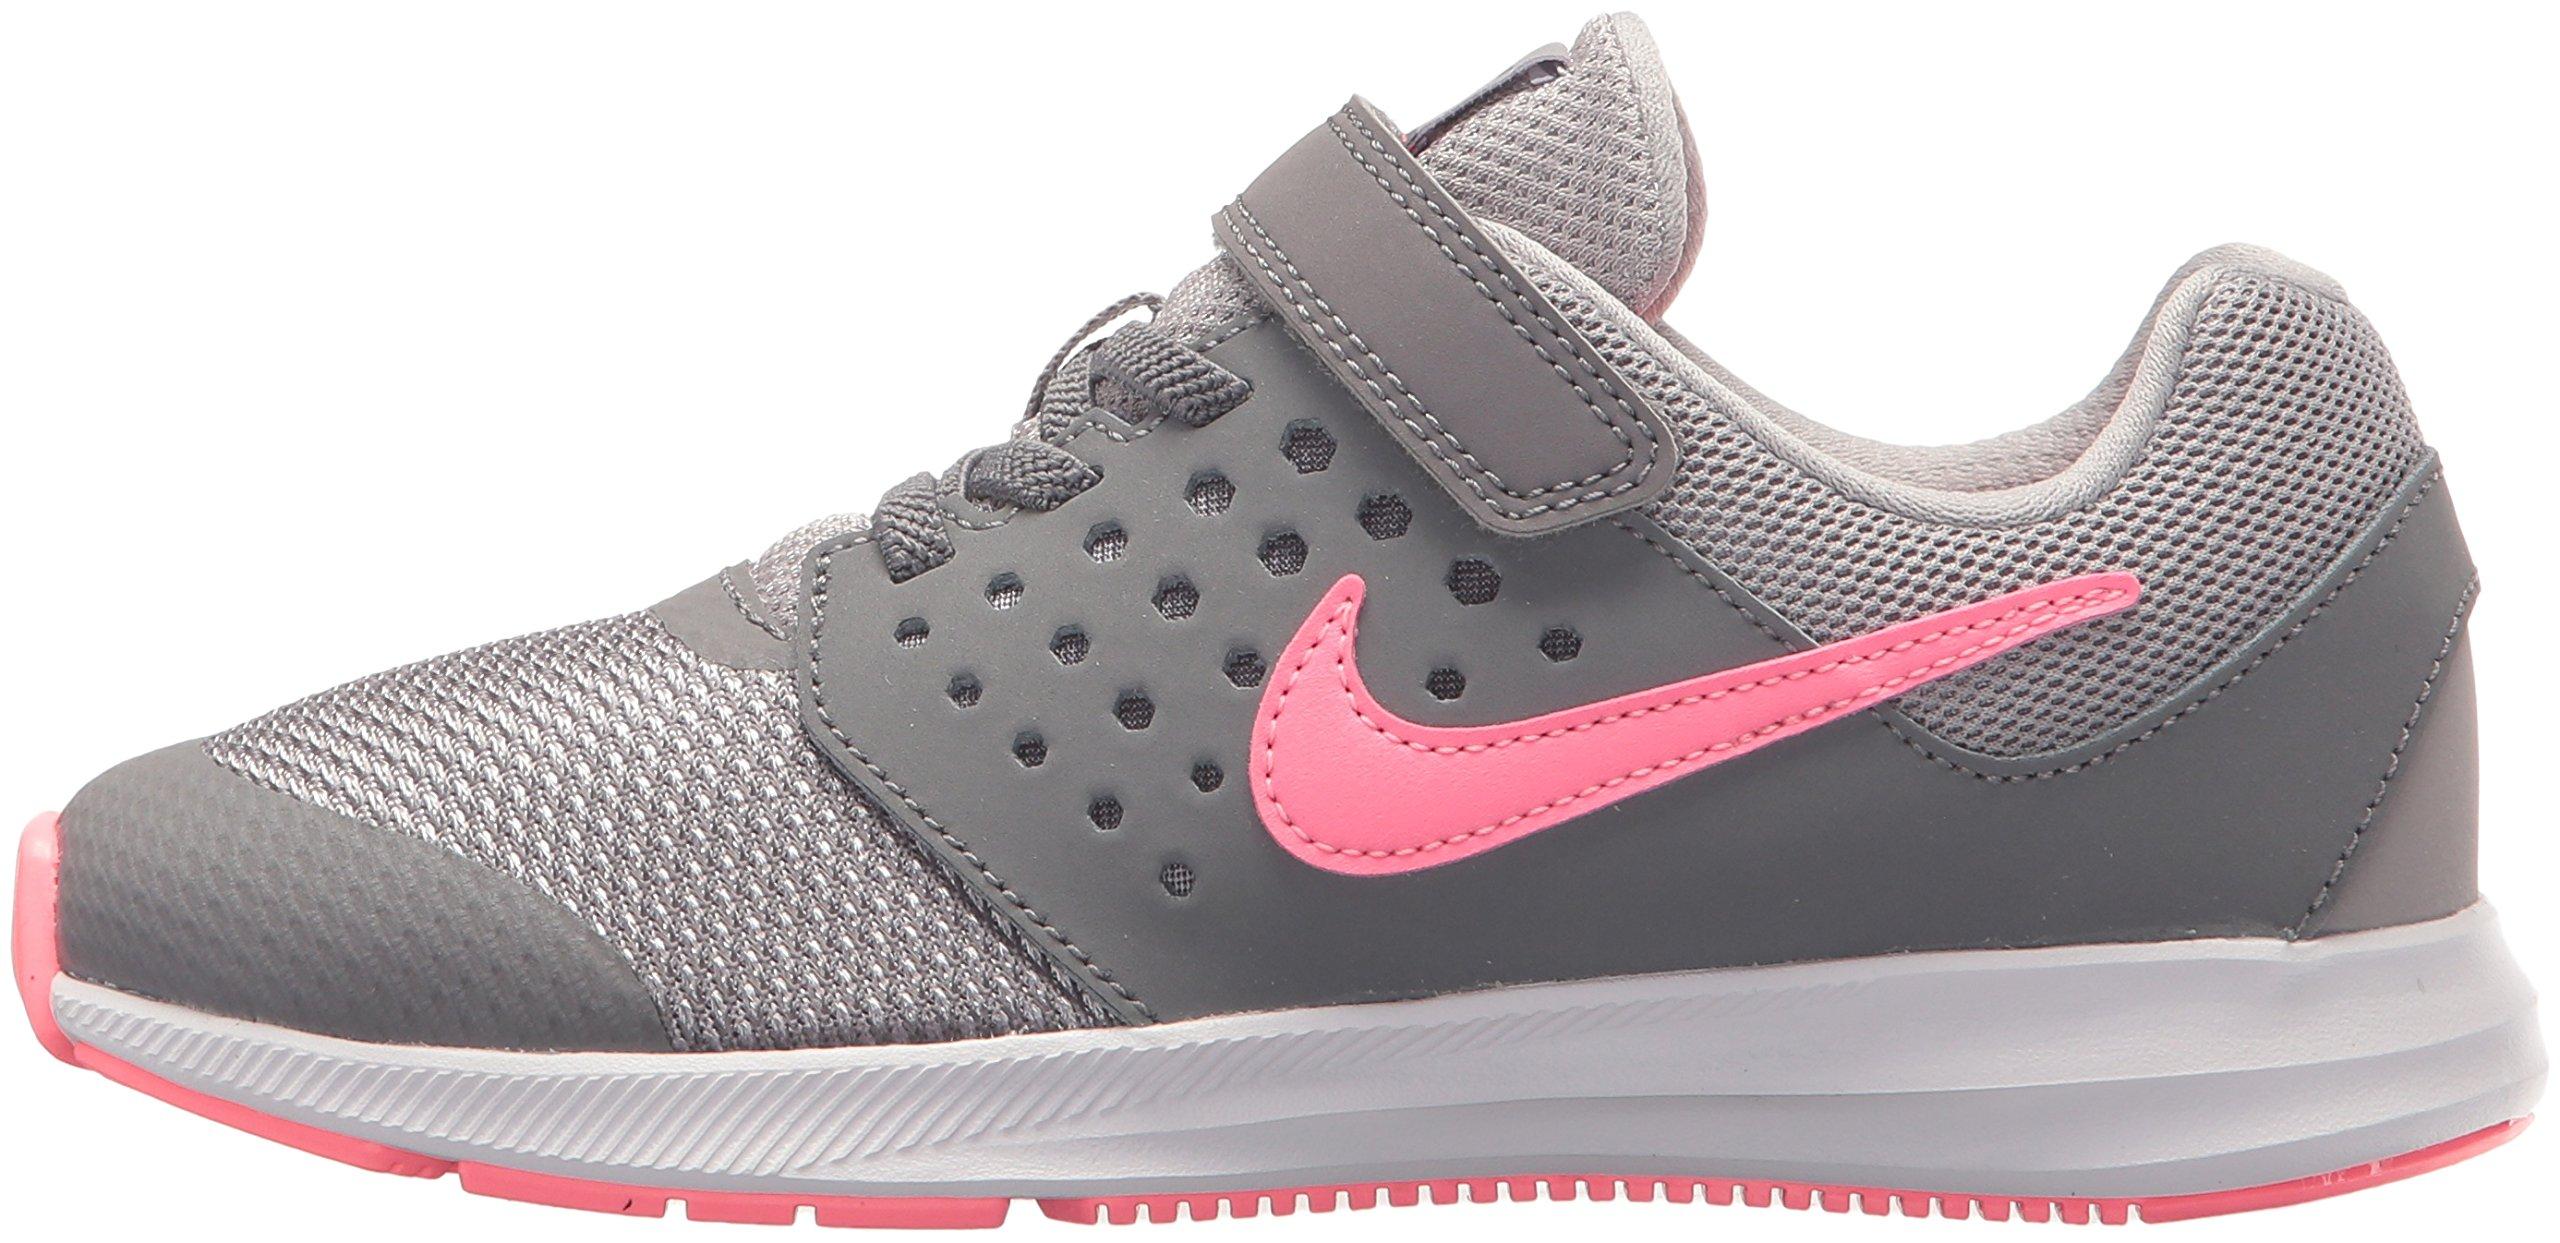 Nike Girls' Downshifter 7 (PSV) Running Shoe, Gunsmoke/Sunset Pulse-Atmosphere Grey, 2 M US Little Kid by Nike (Image #5)